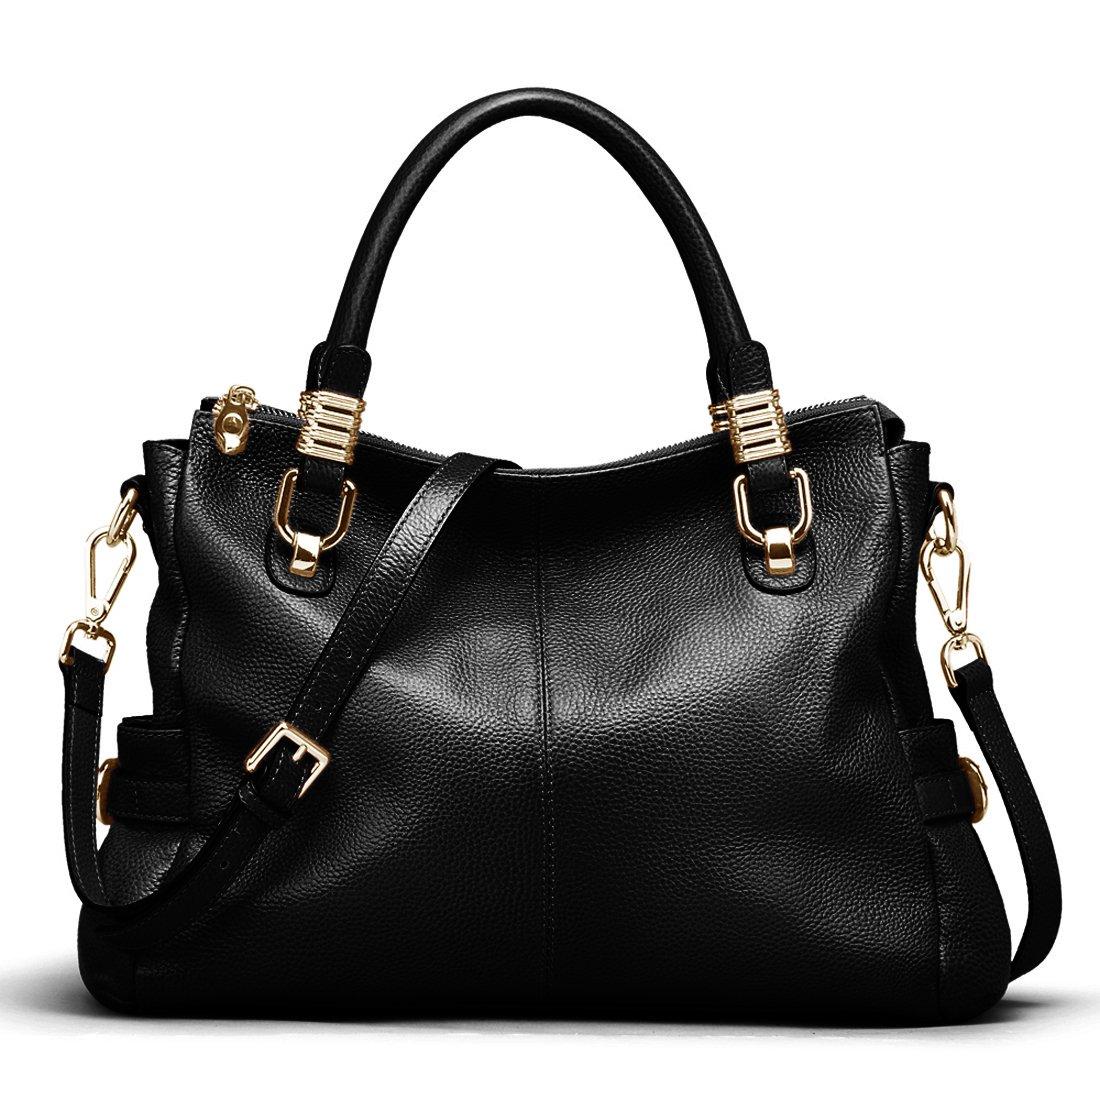 5a5e6836321b Amazon.com  AINIMOER Womens Genuine Leather Vintage Tote Shoulder Bag  Top-handle Crossbody Handbags Large Capacity Ladies  Purse (Black)  Shoes